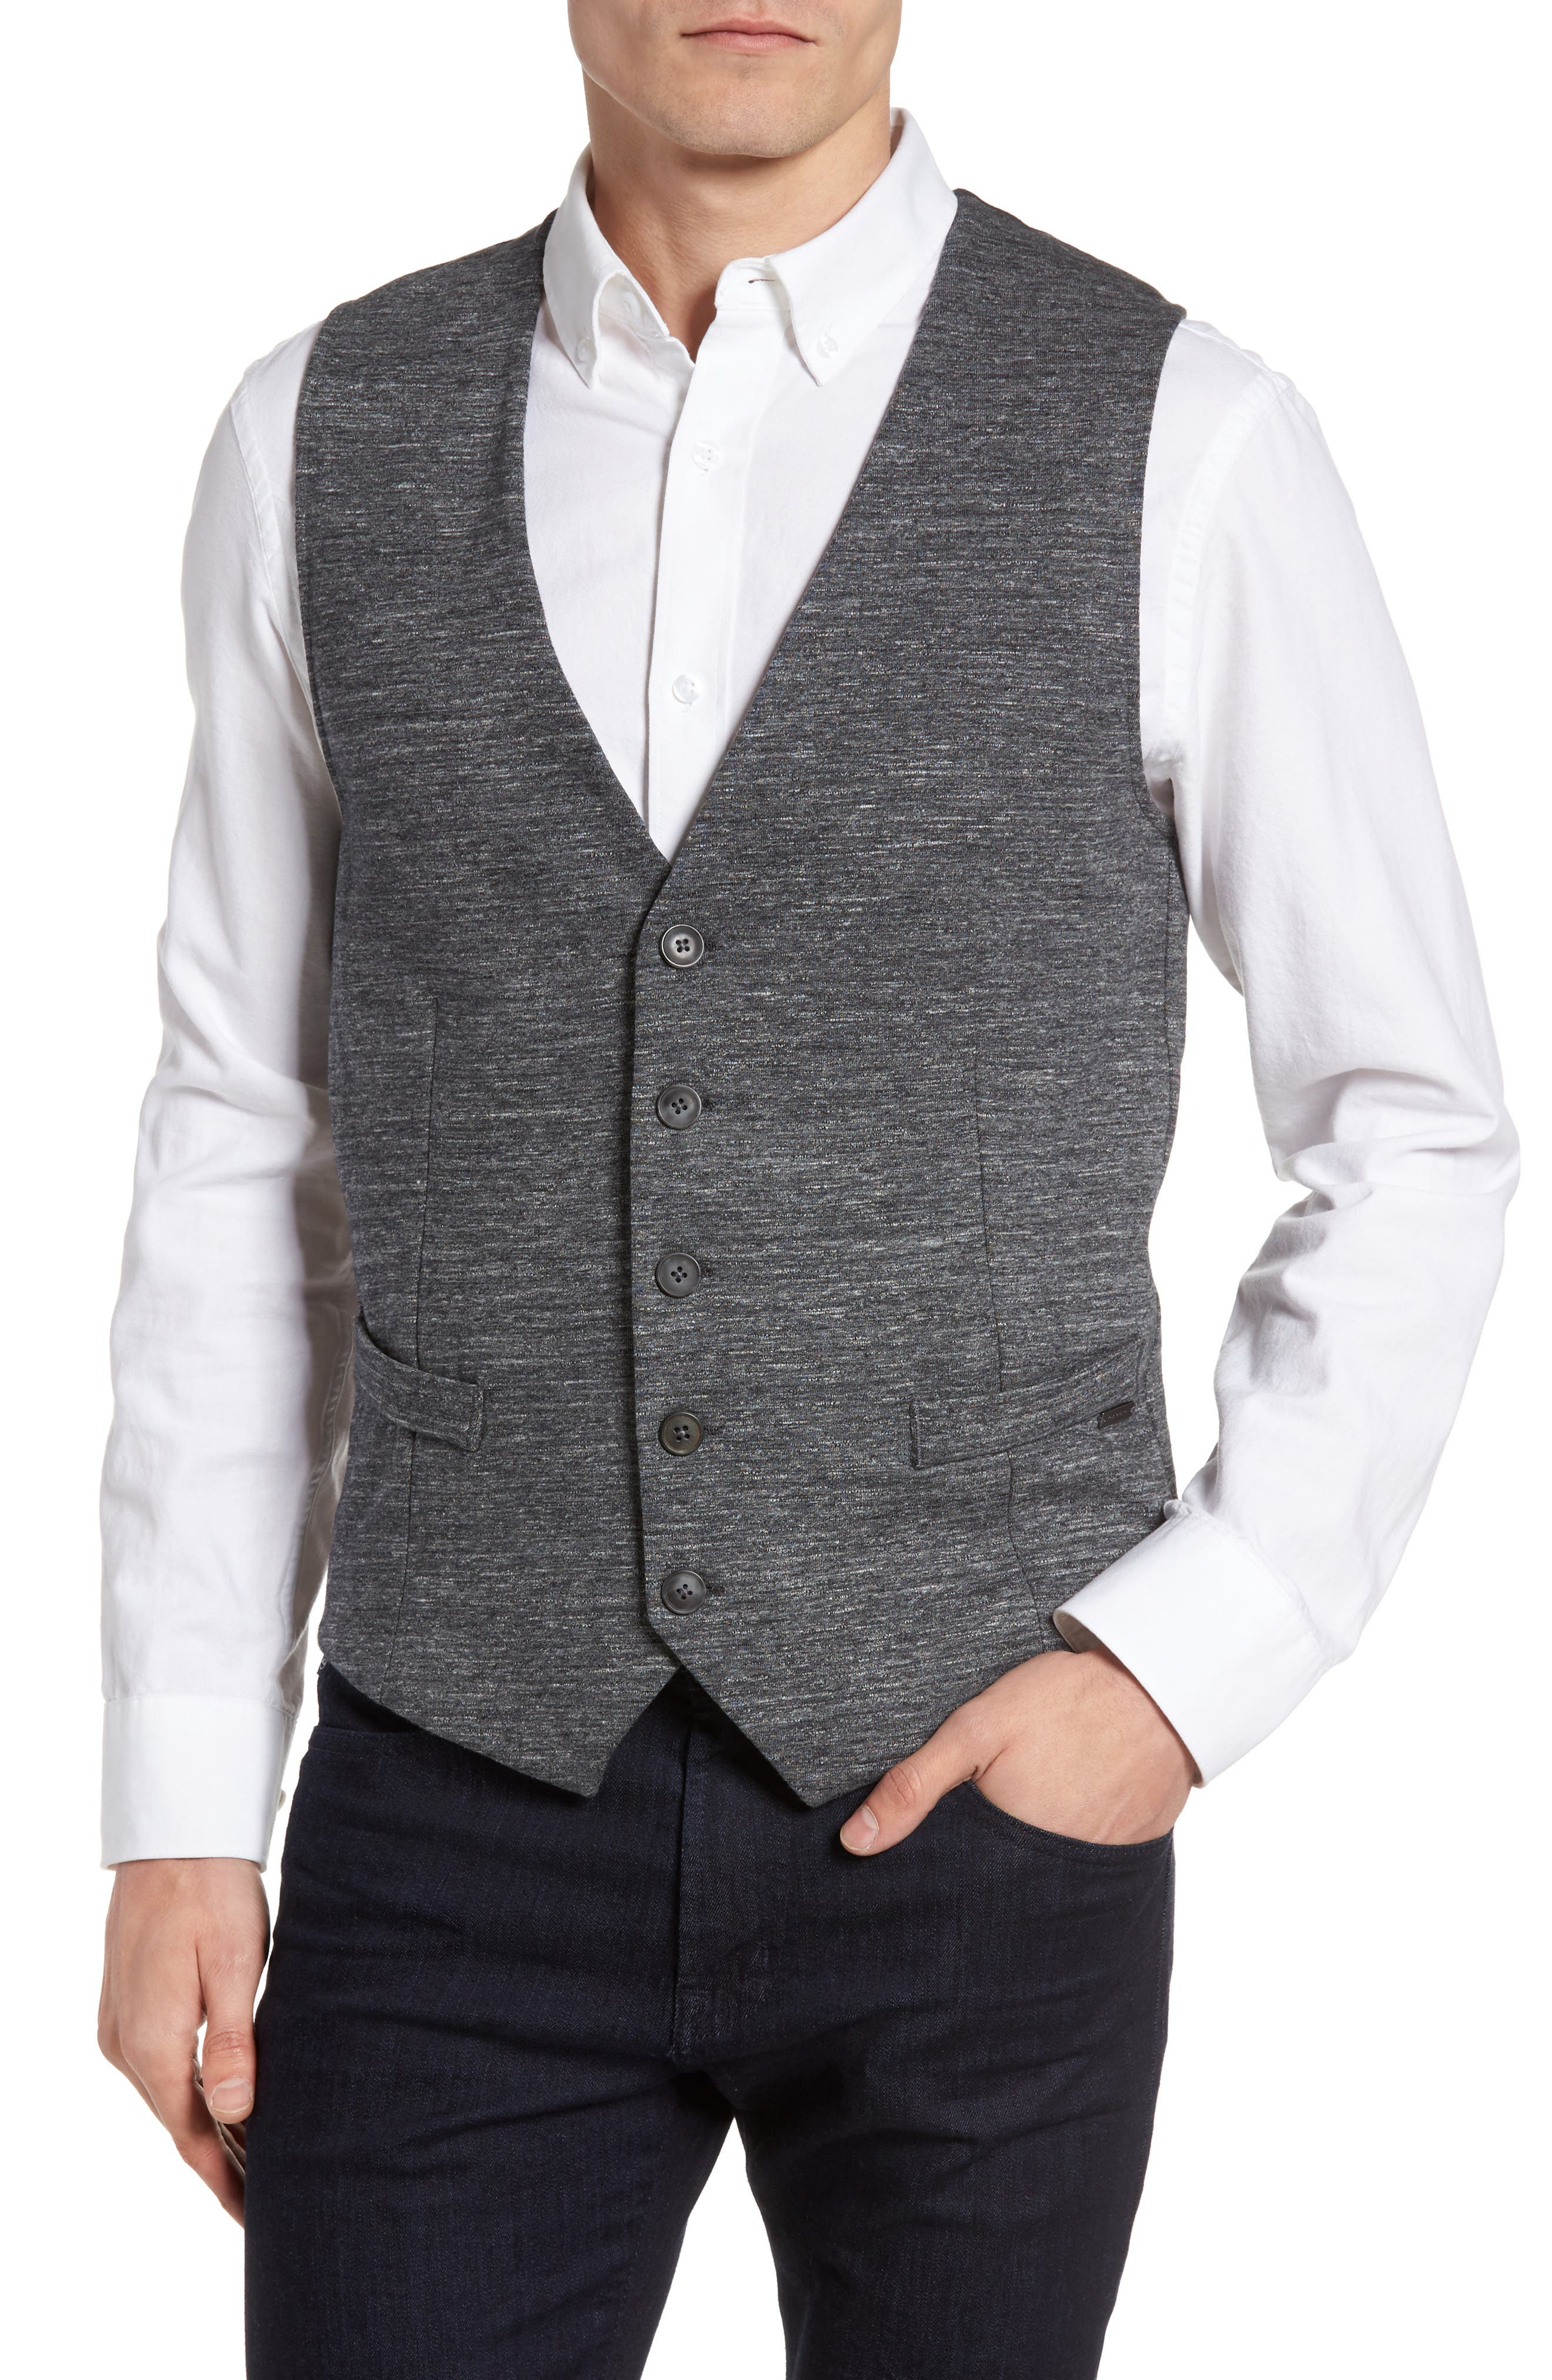 Wutang Jersey Vest,                             Main thumbnail 1, color,                             Light Pastel/ Grey